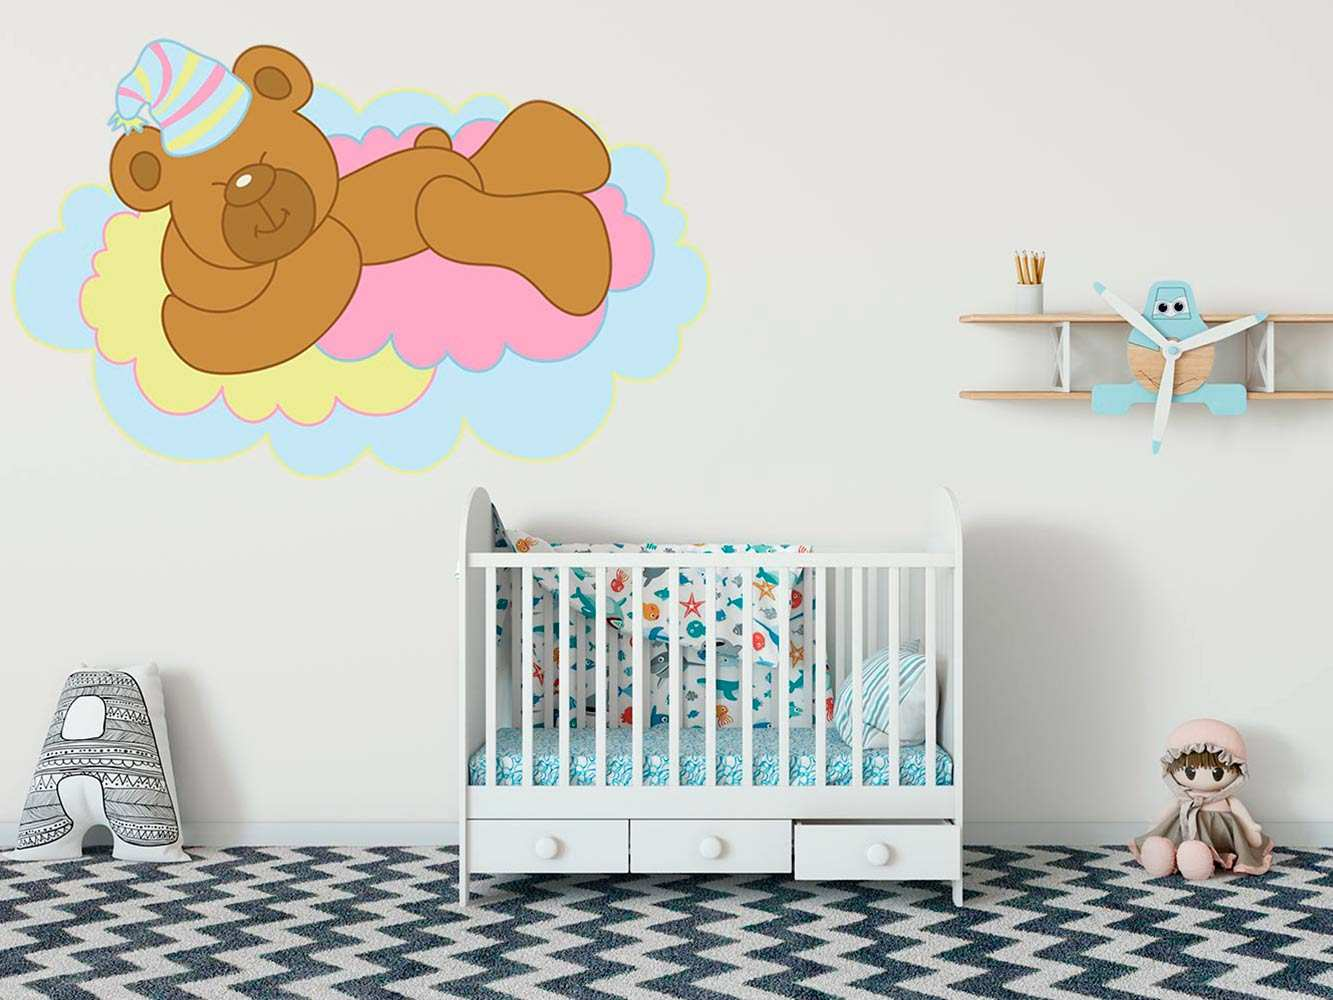 Vinilo Infantil Osito Nube Colores | Carteles XXL - Impresión carteleria publicitaria